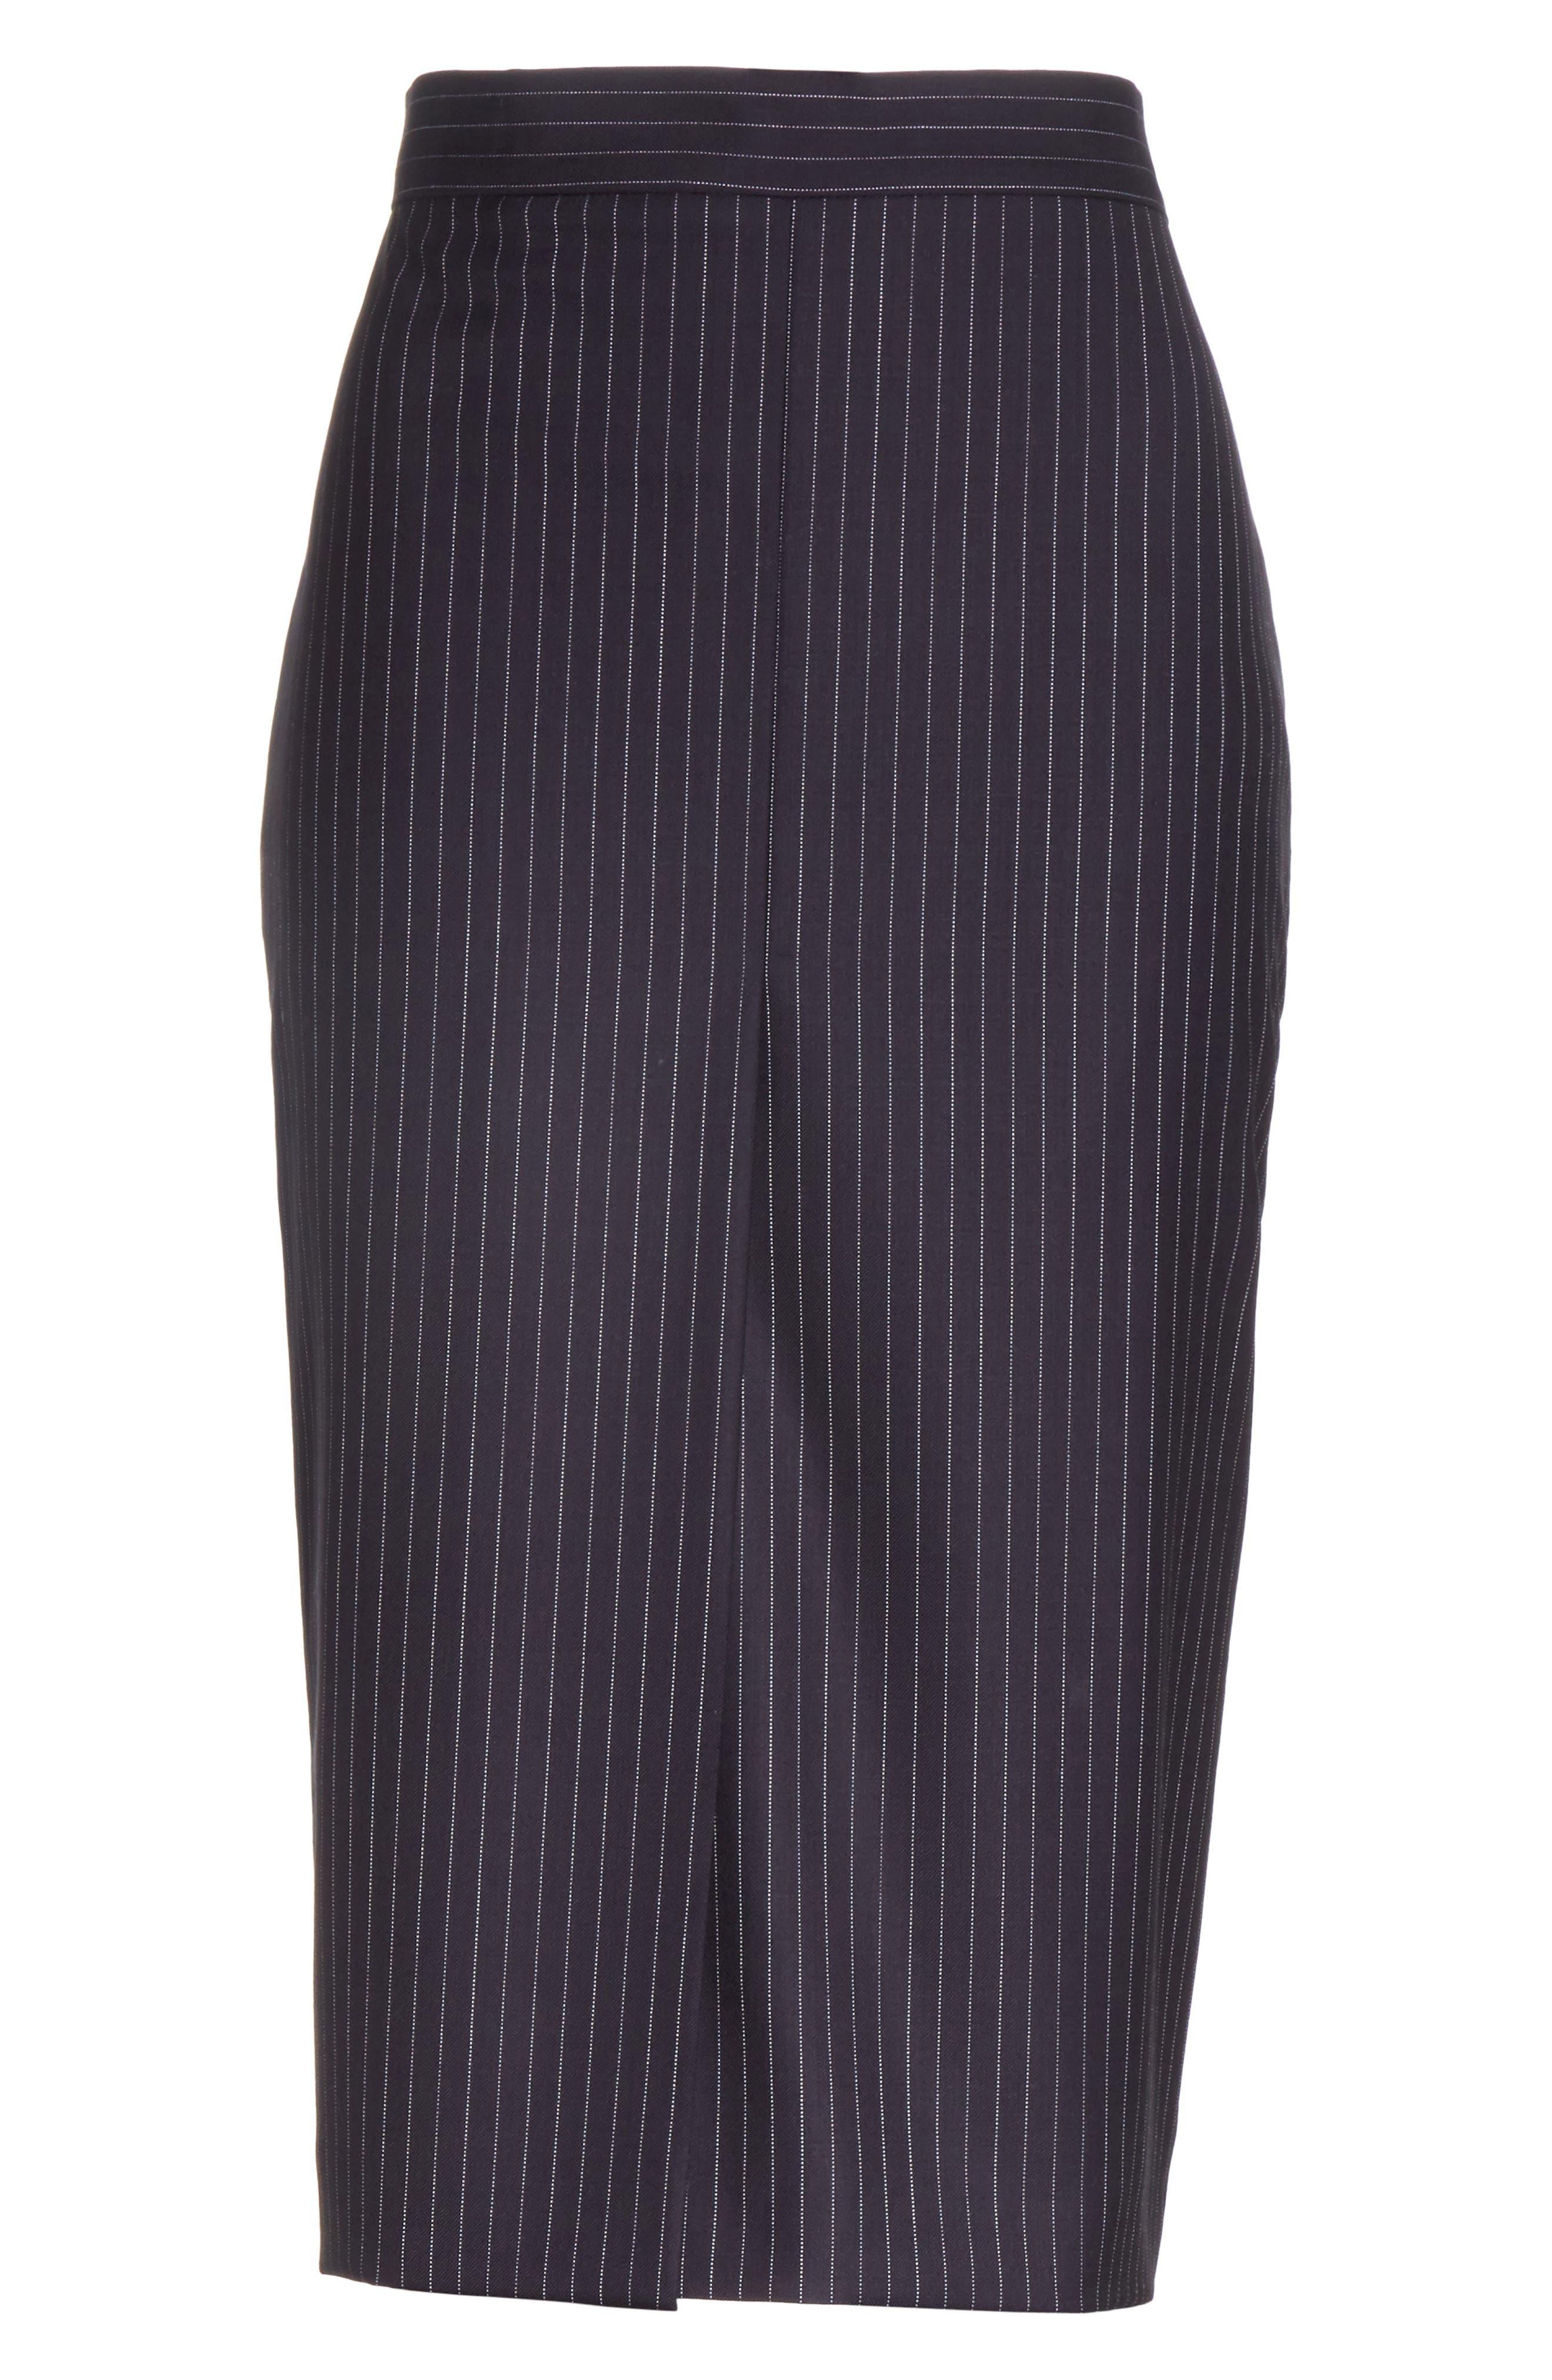 Abba Pinstripe Pencil Skirt,                             Alternate thumbnail 6, color,                             411